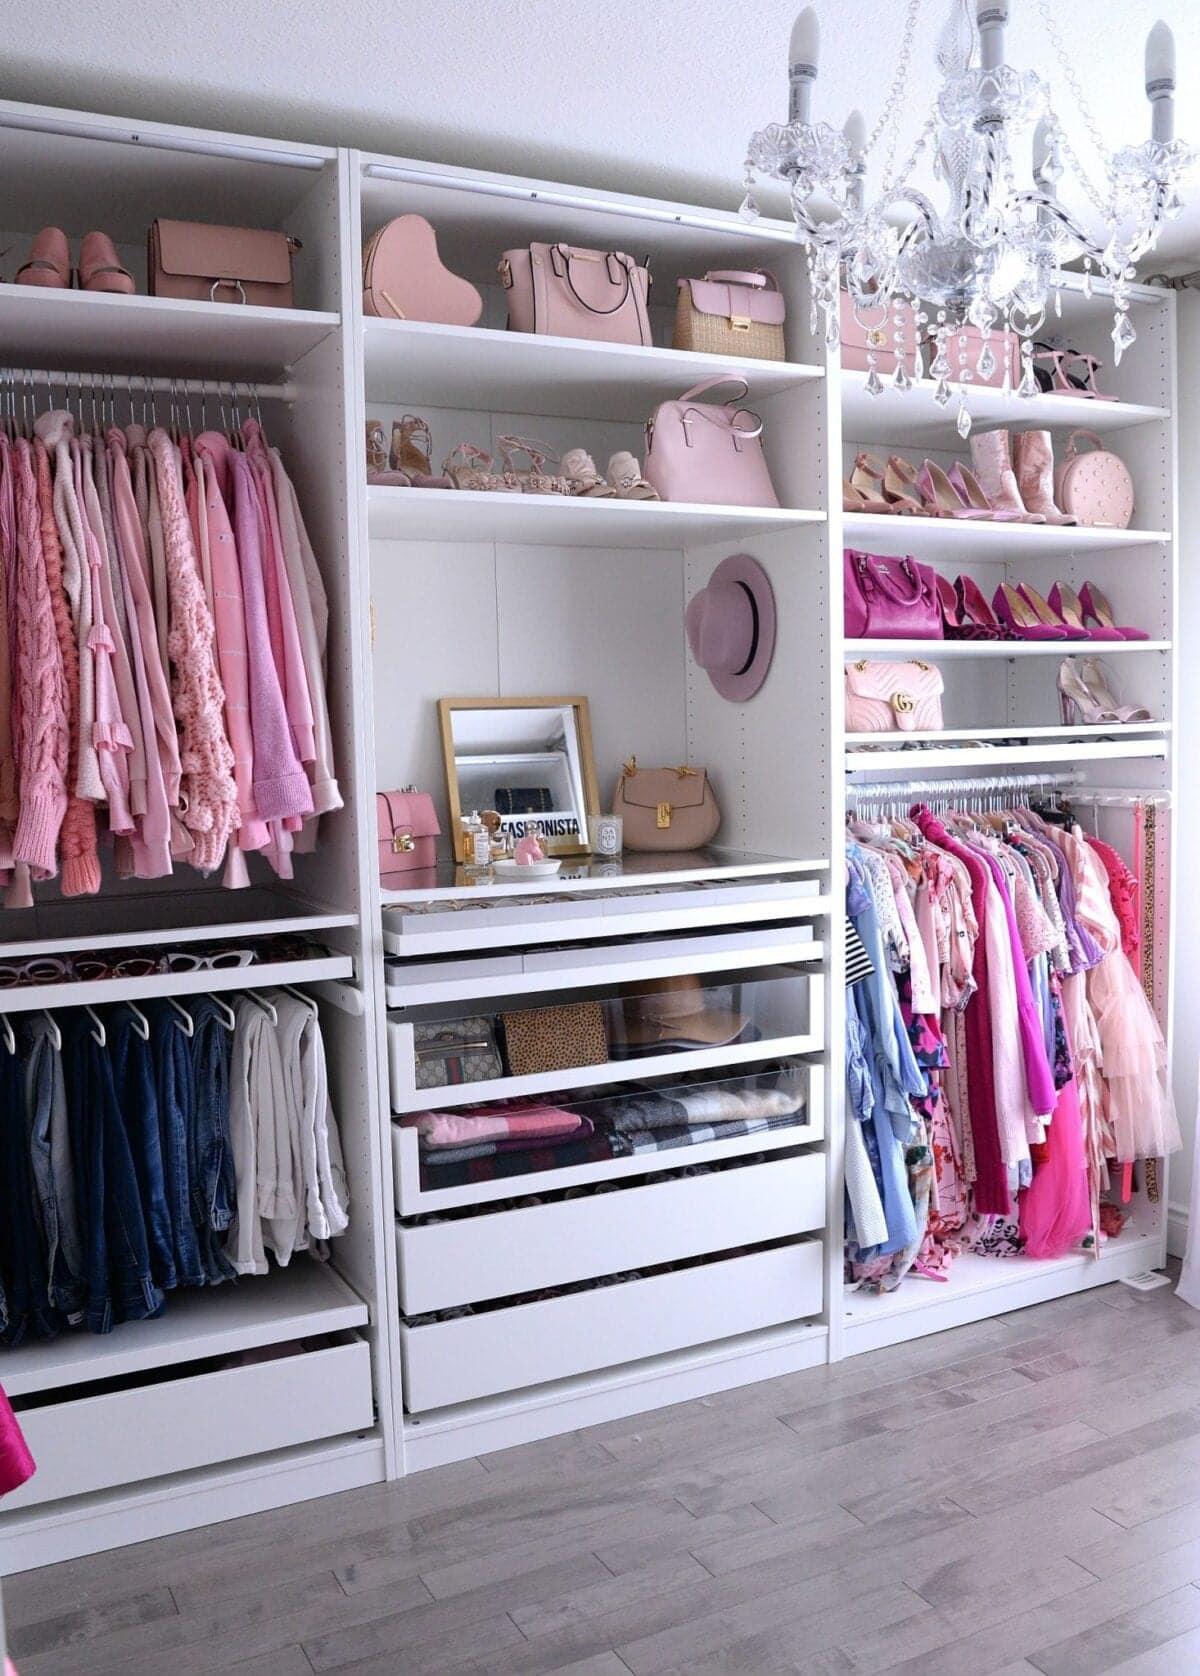 IKEA PAX Closet with pink accessories niche